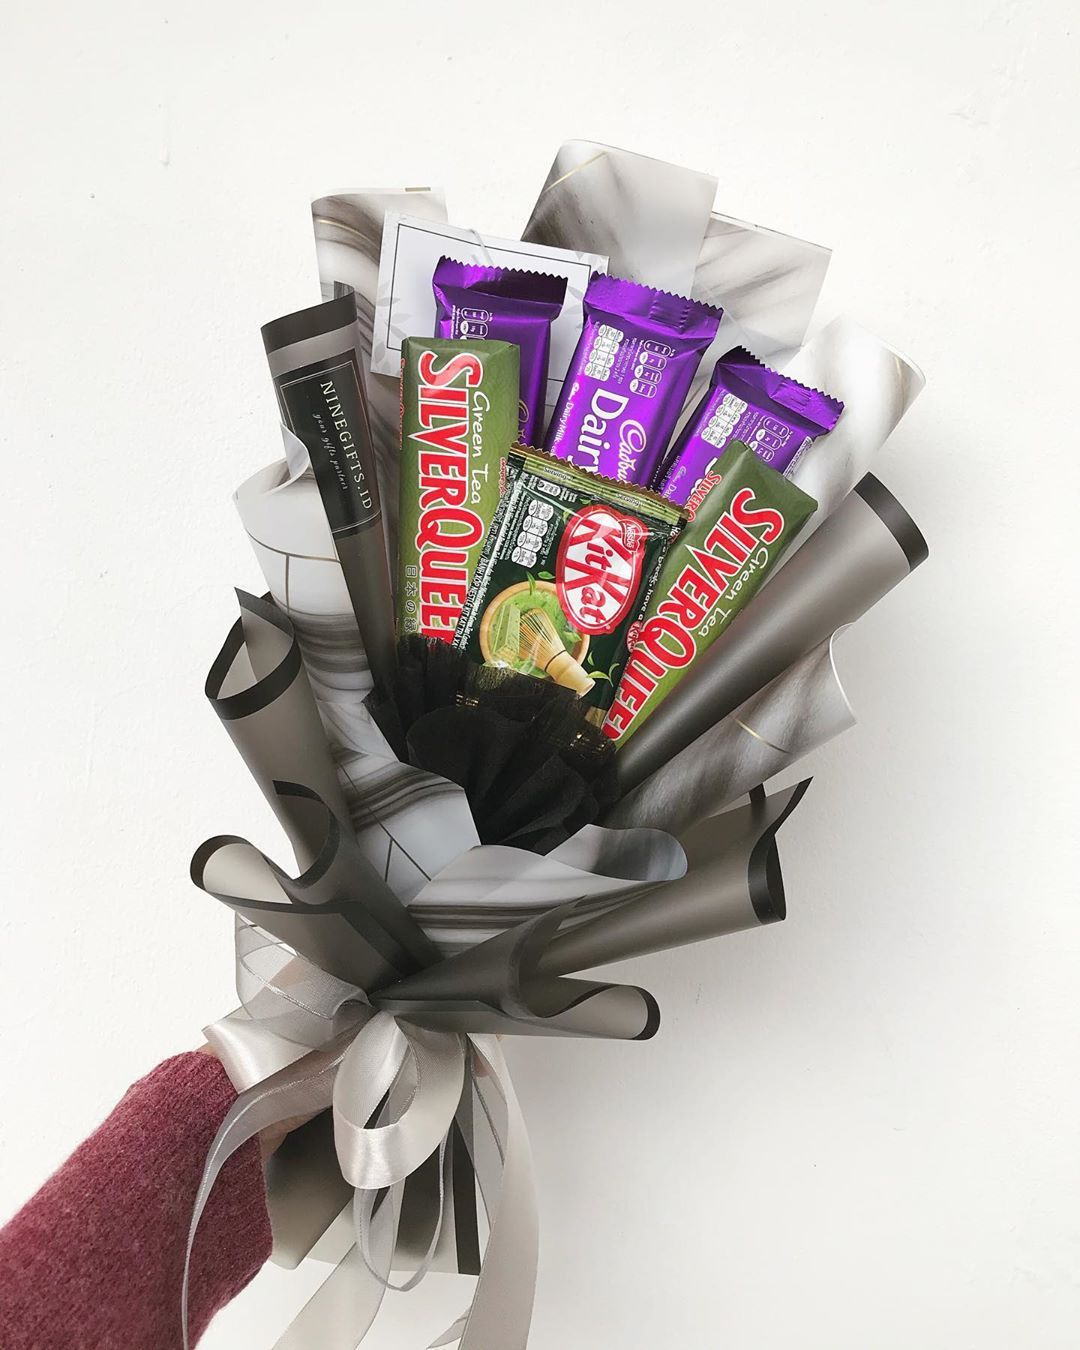 Snack Bouquet Bandung Murah On Instagram Ready To Send Only 130k Chocolate Bouquet Isi 3pcs Coklat Bunga Kertas Tisu Valentine Bunga Buatan Sendiri